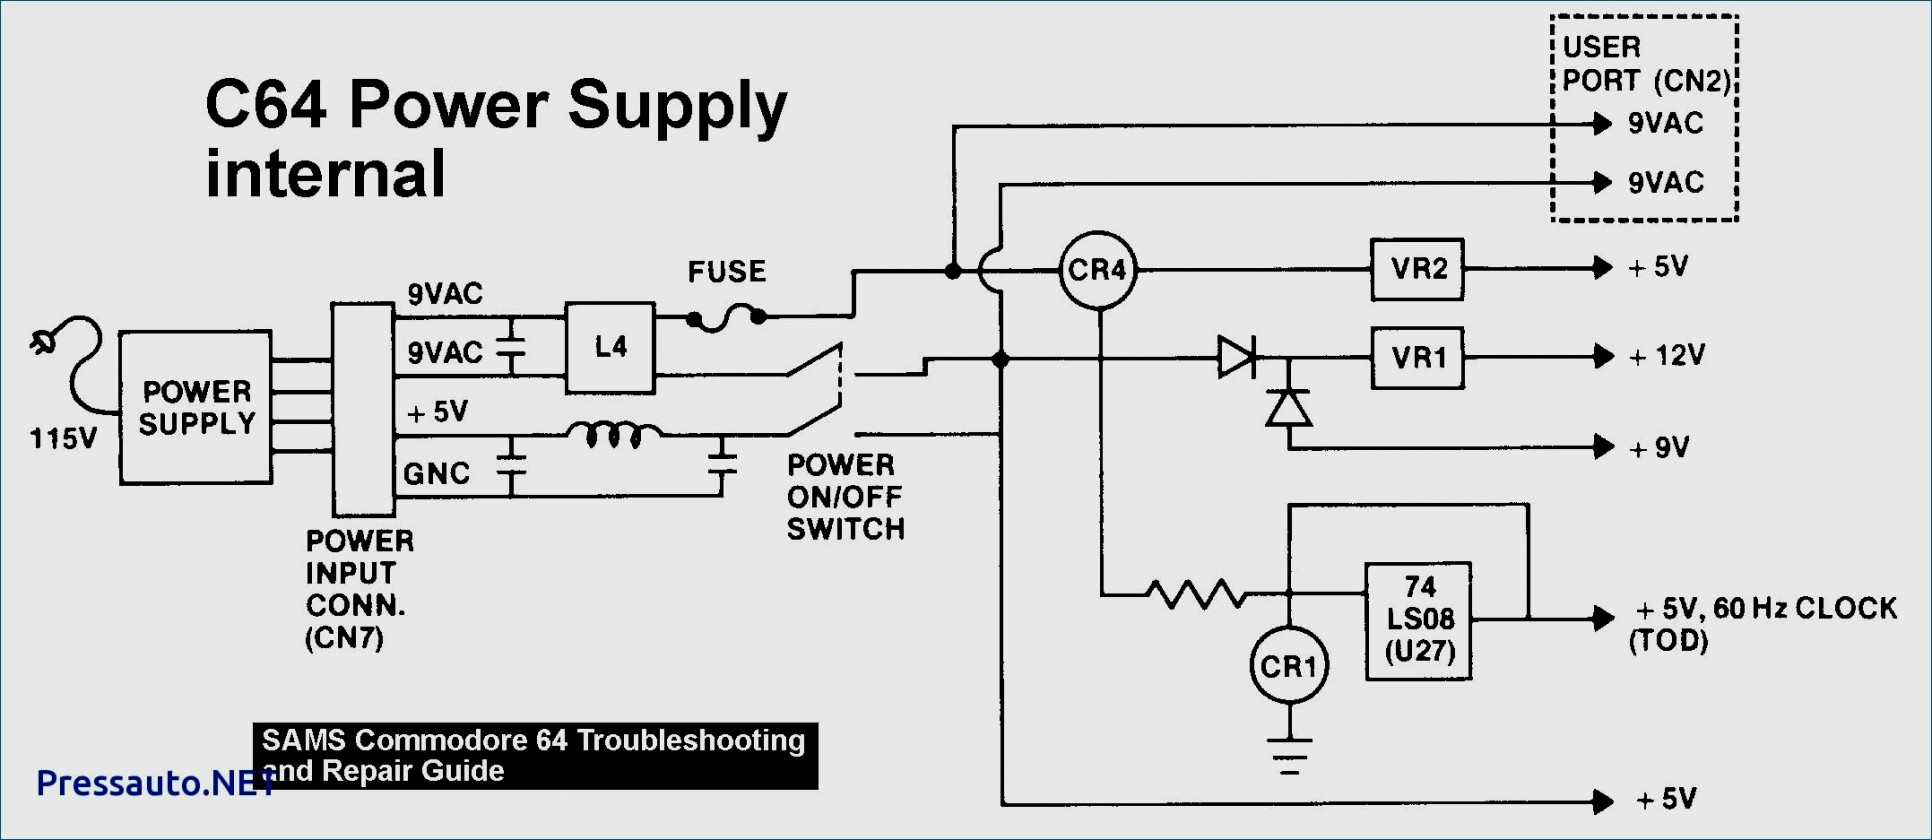 Motherboard Diagram Circuit Diagram Schematic Diagram Hp - Your